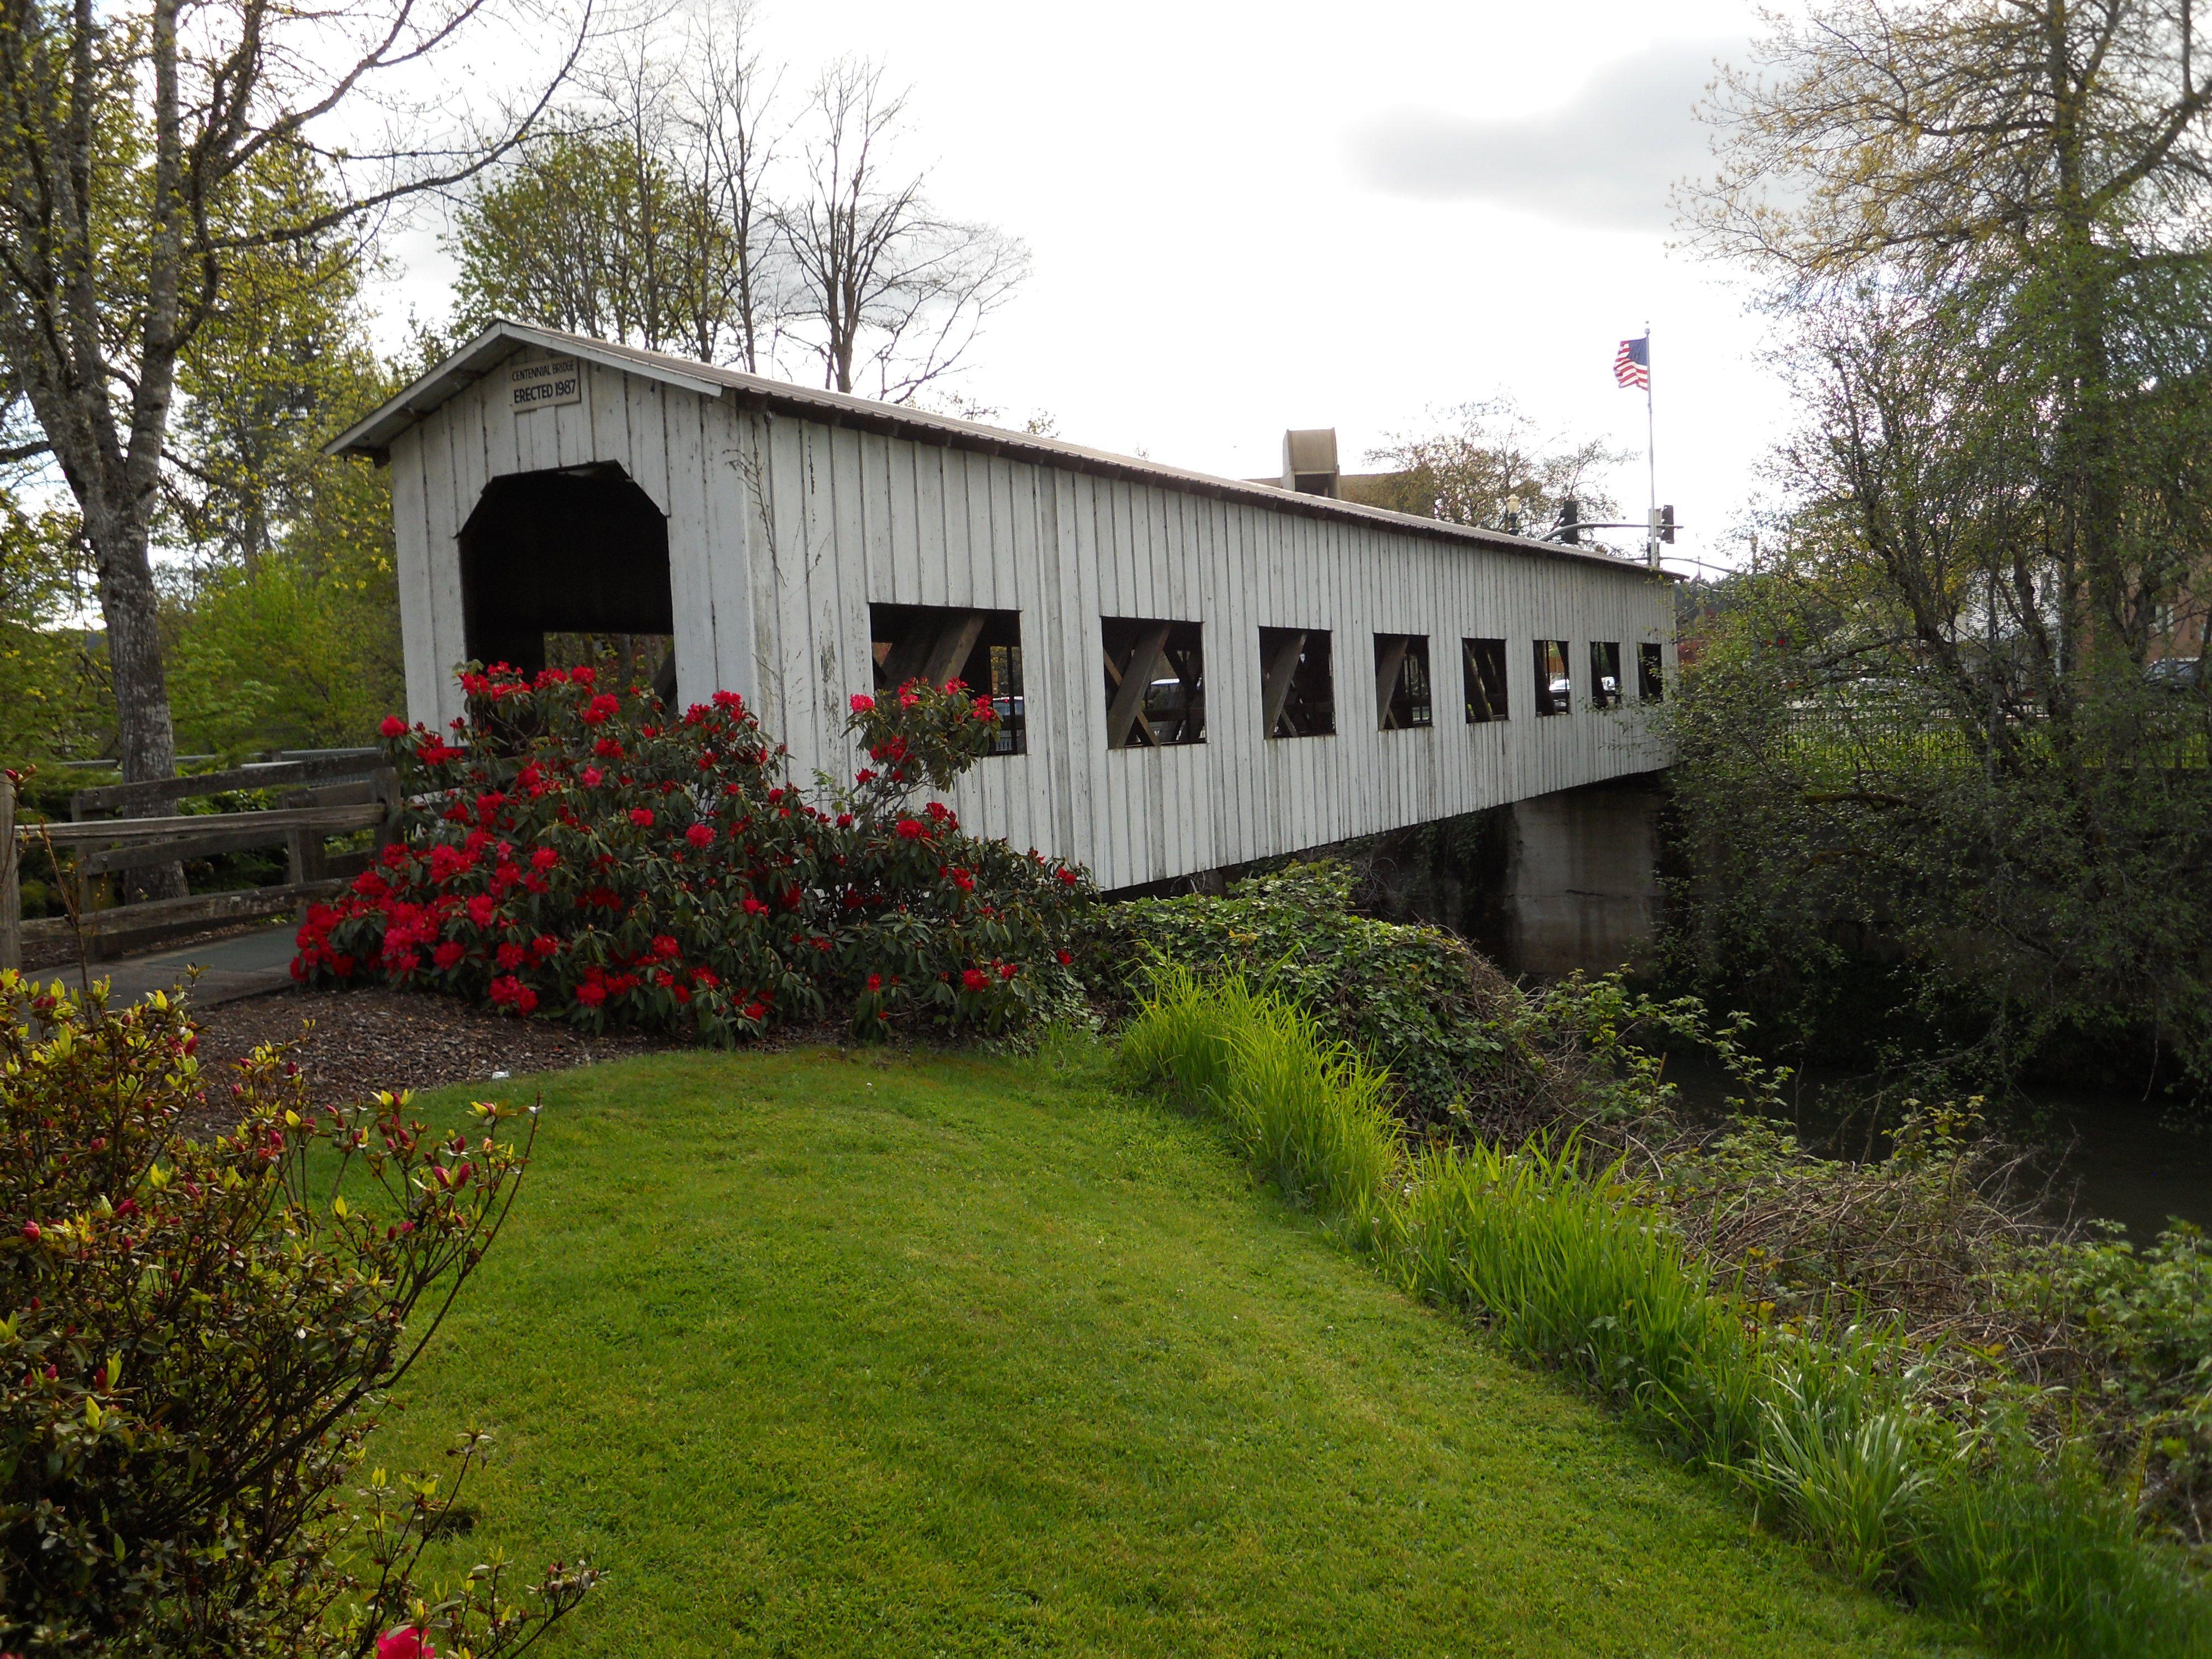 Covered Bridge Cottage Grove Oregon Covered Bridges Scenic Bridges Cottage Grove